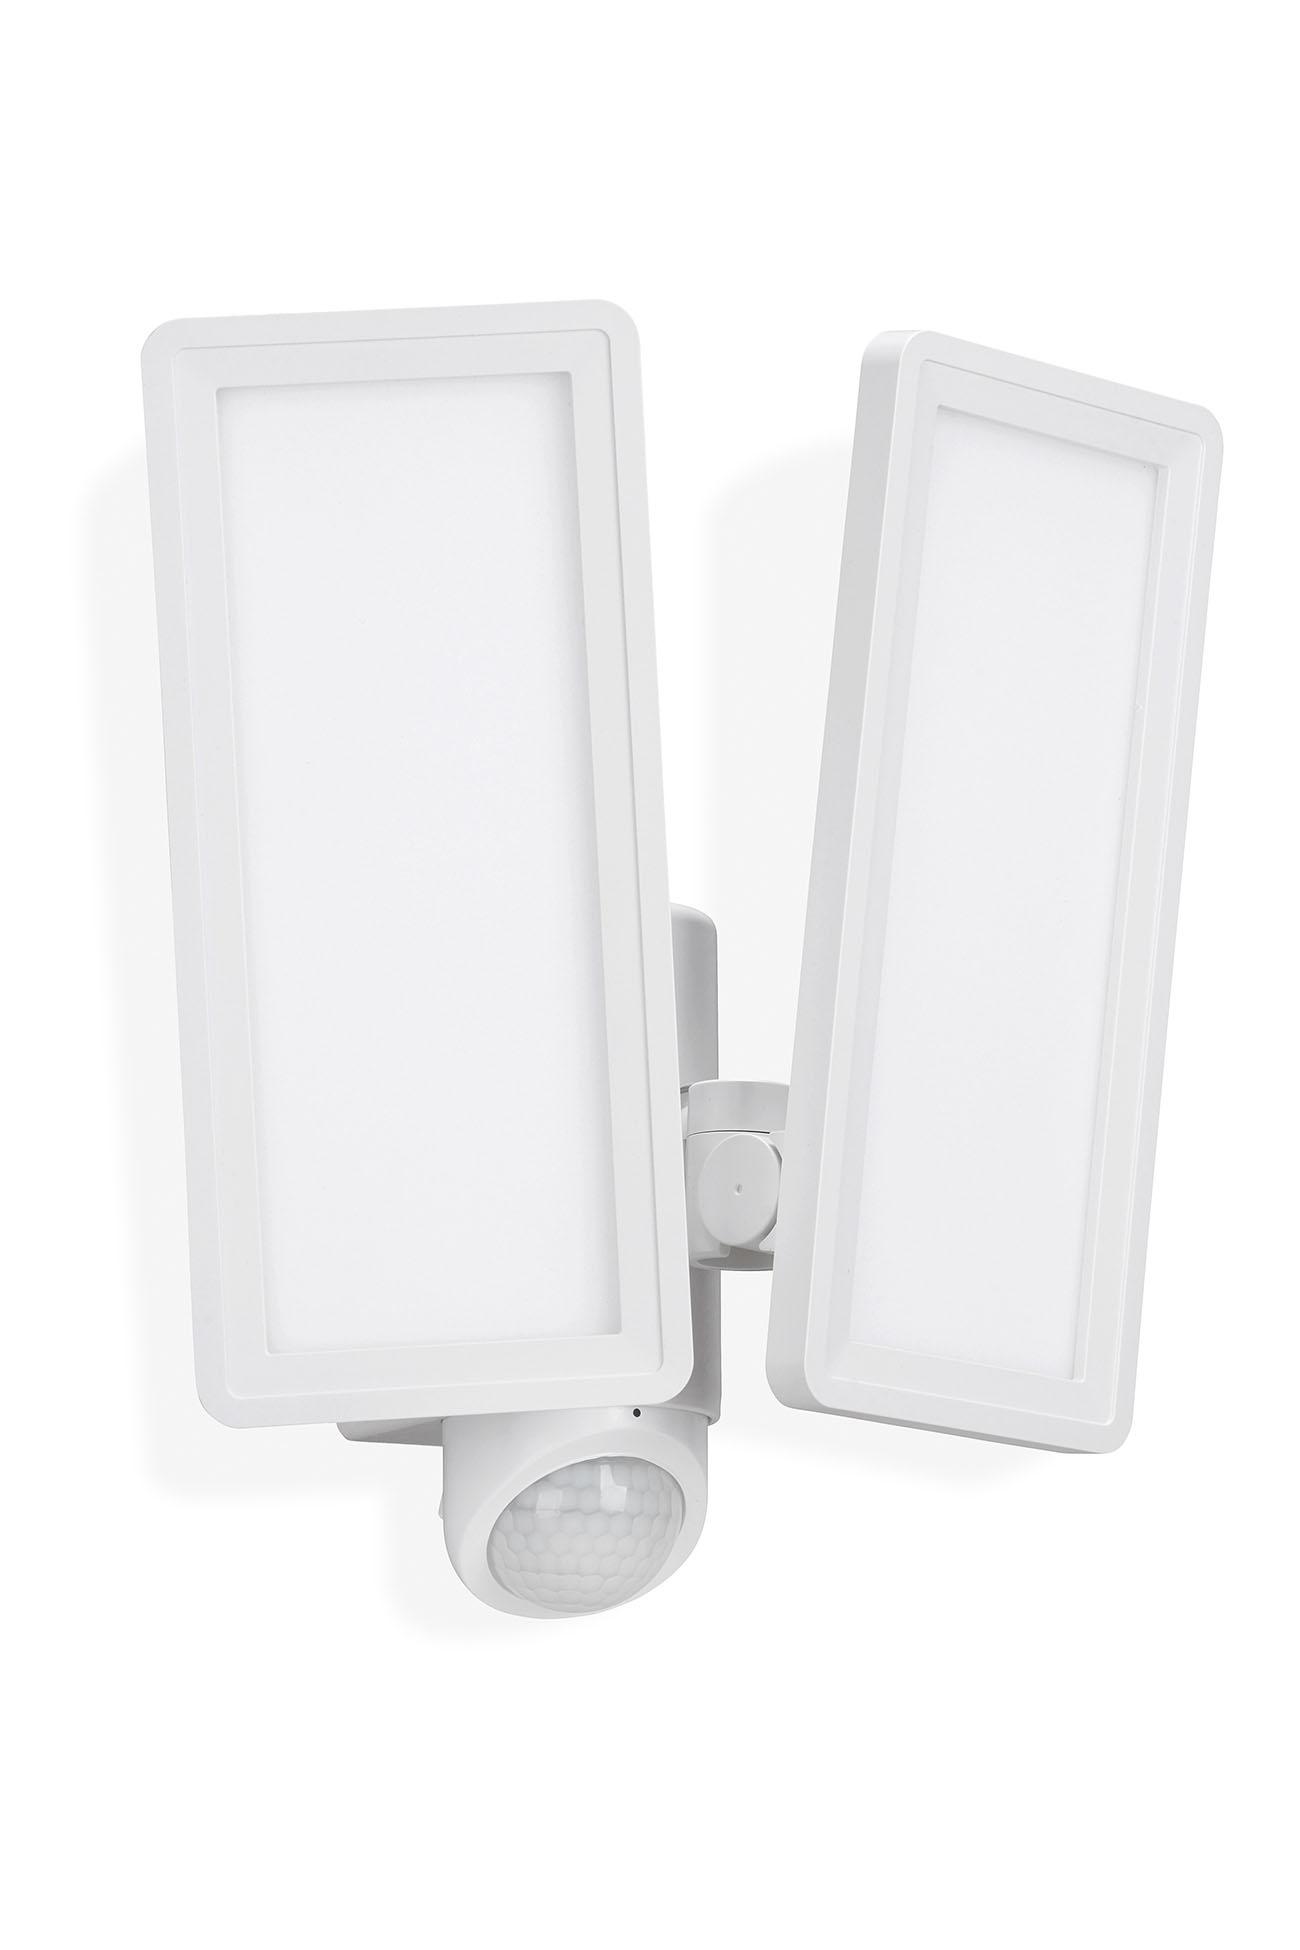 TELEFUNKEN LED Sensor Außenstrahler, 28,7 cm, 24 W, Weiß